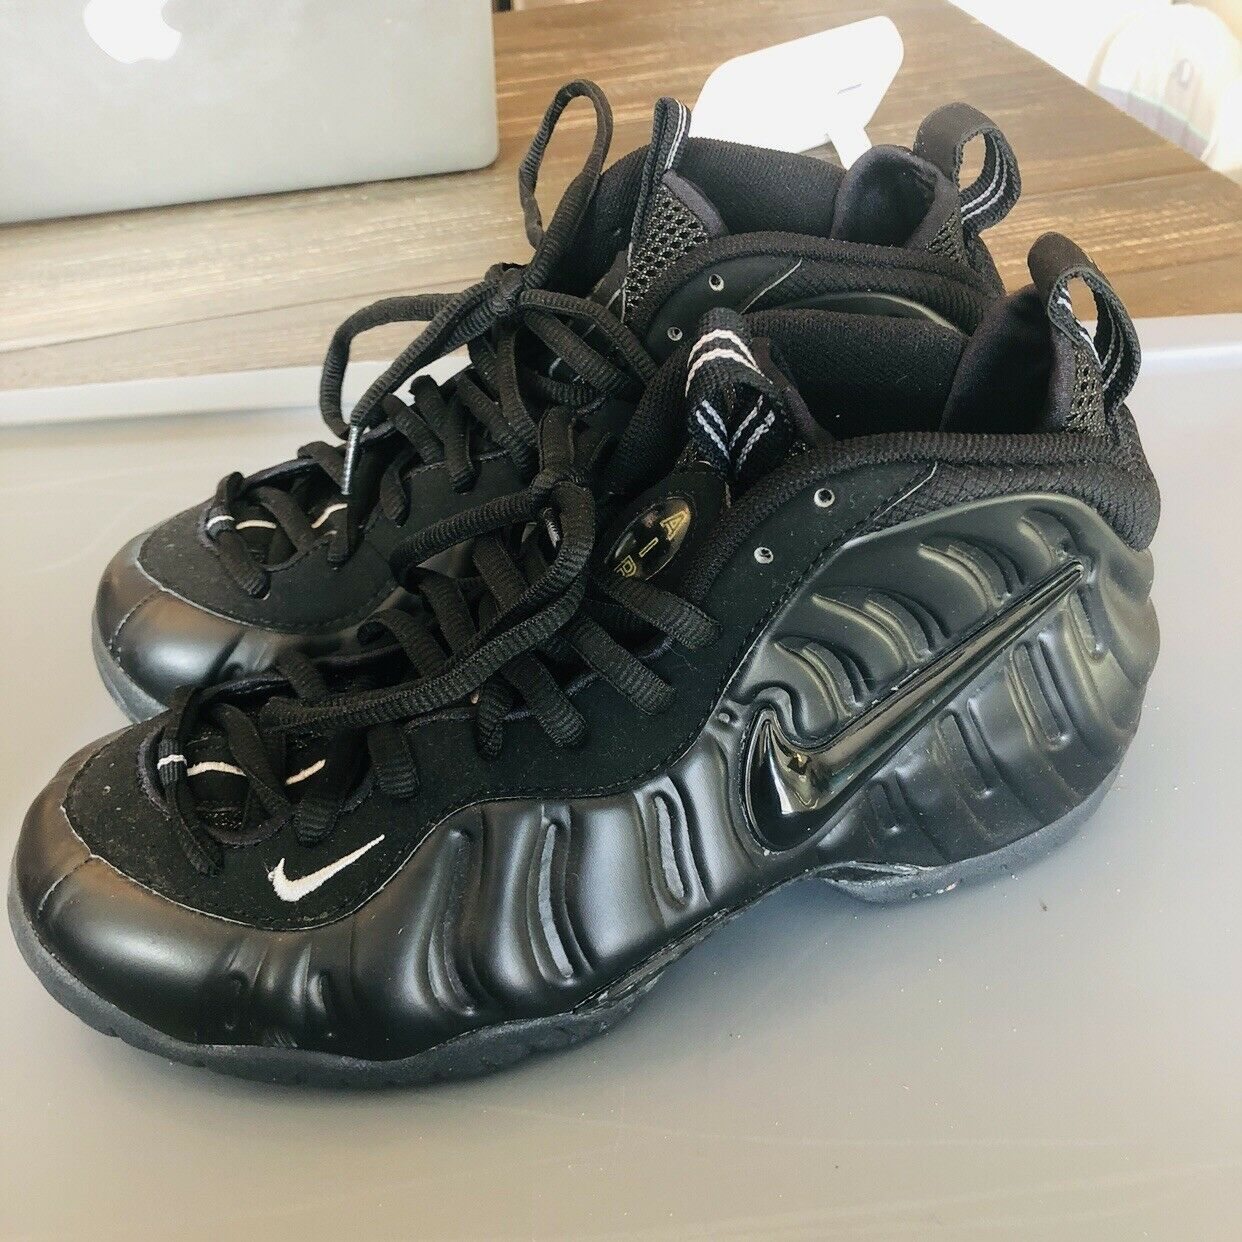 Nike Air Foamposite Pro Black Medium Grey 2000 Mens Size 8.5 630304-002